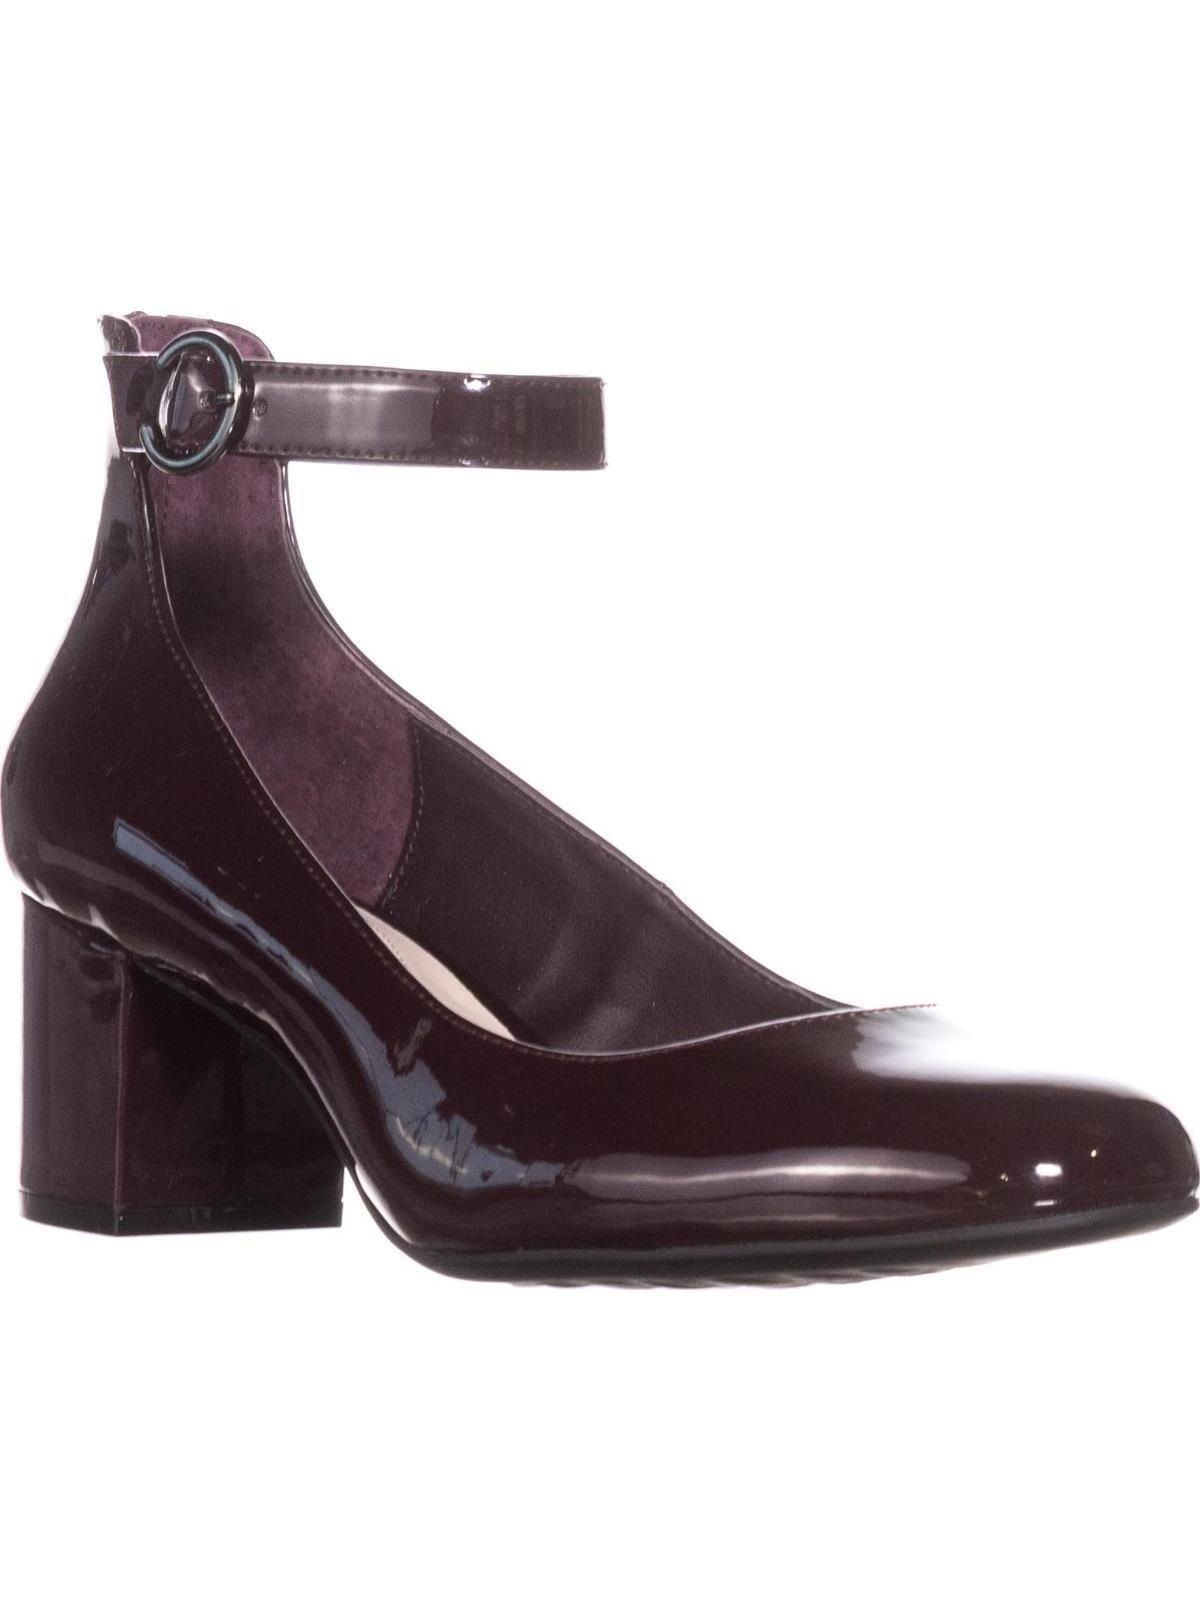 028b2180e1a8 A35 - Womens A35 Ashiaa Ankle Strap Pumps